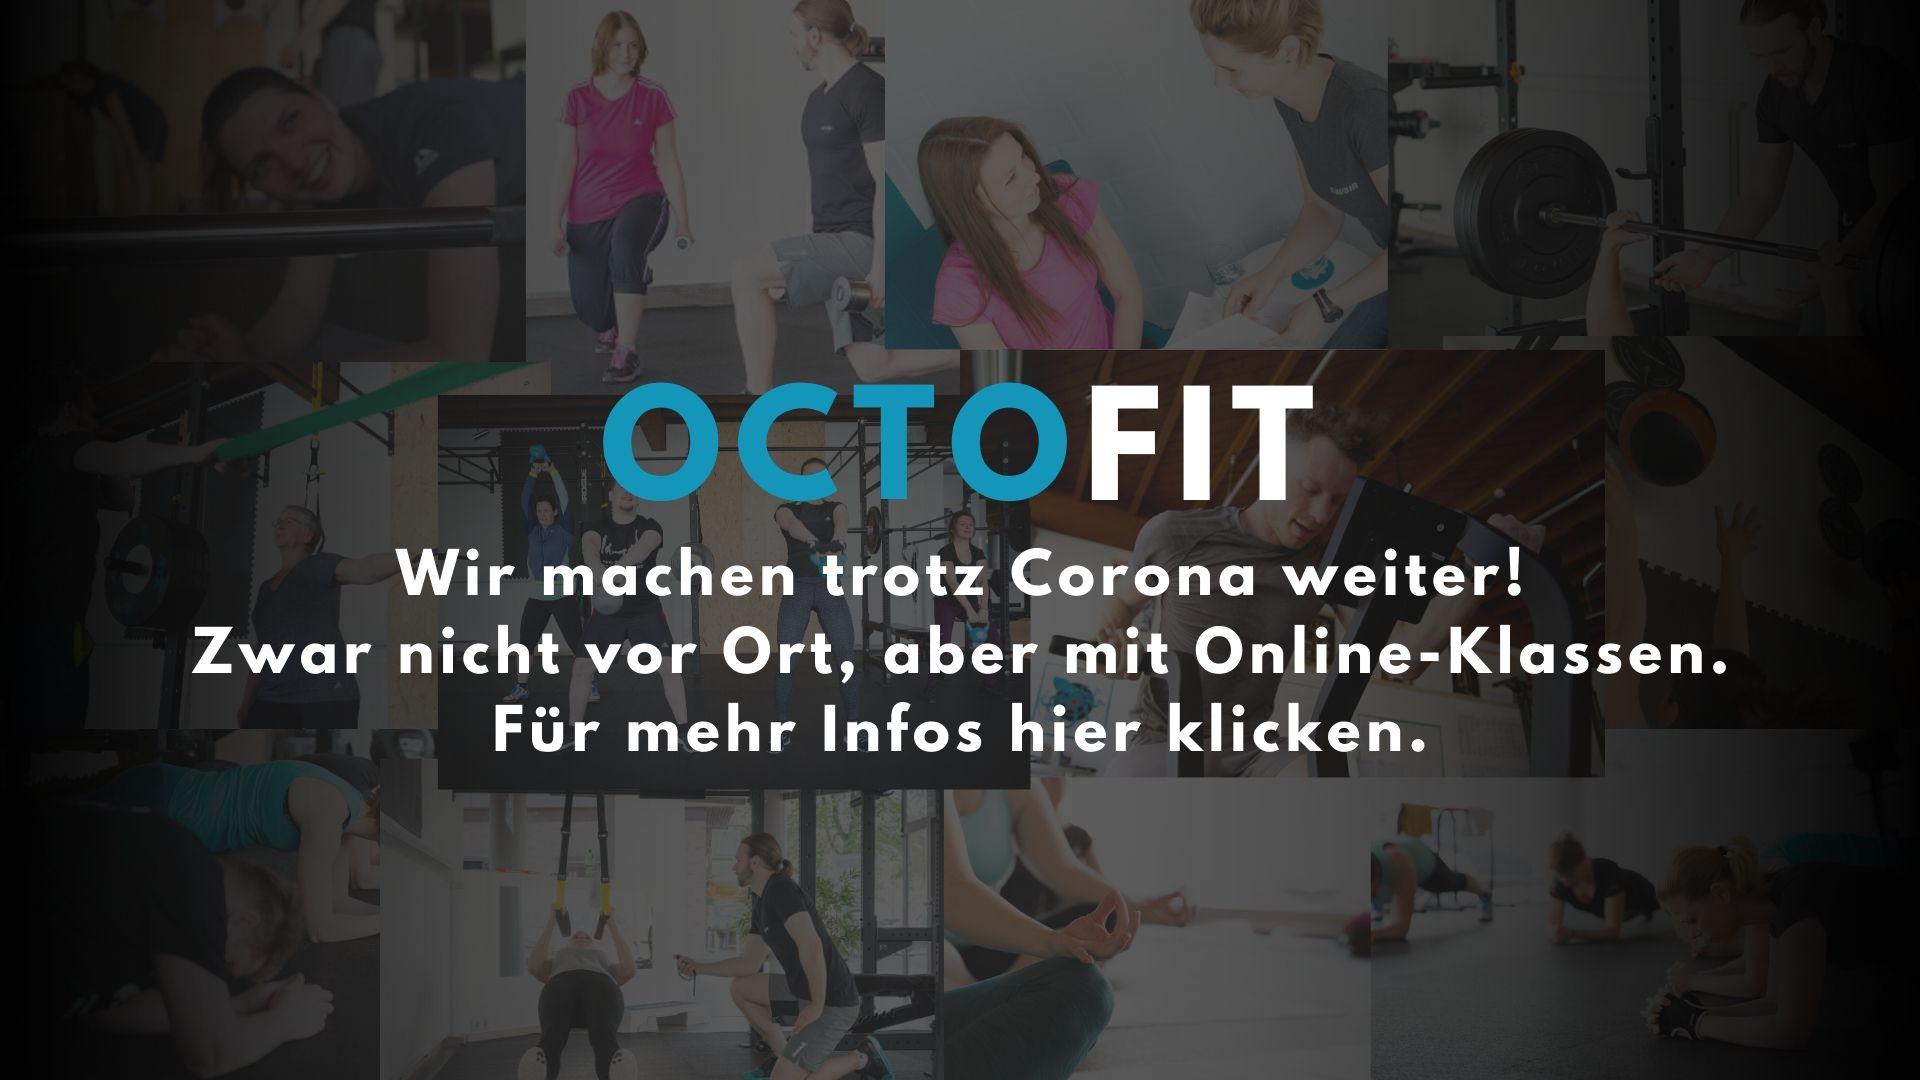 Octofit Landingpage Header Fitness Corona Luenen